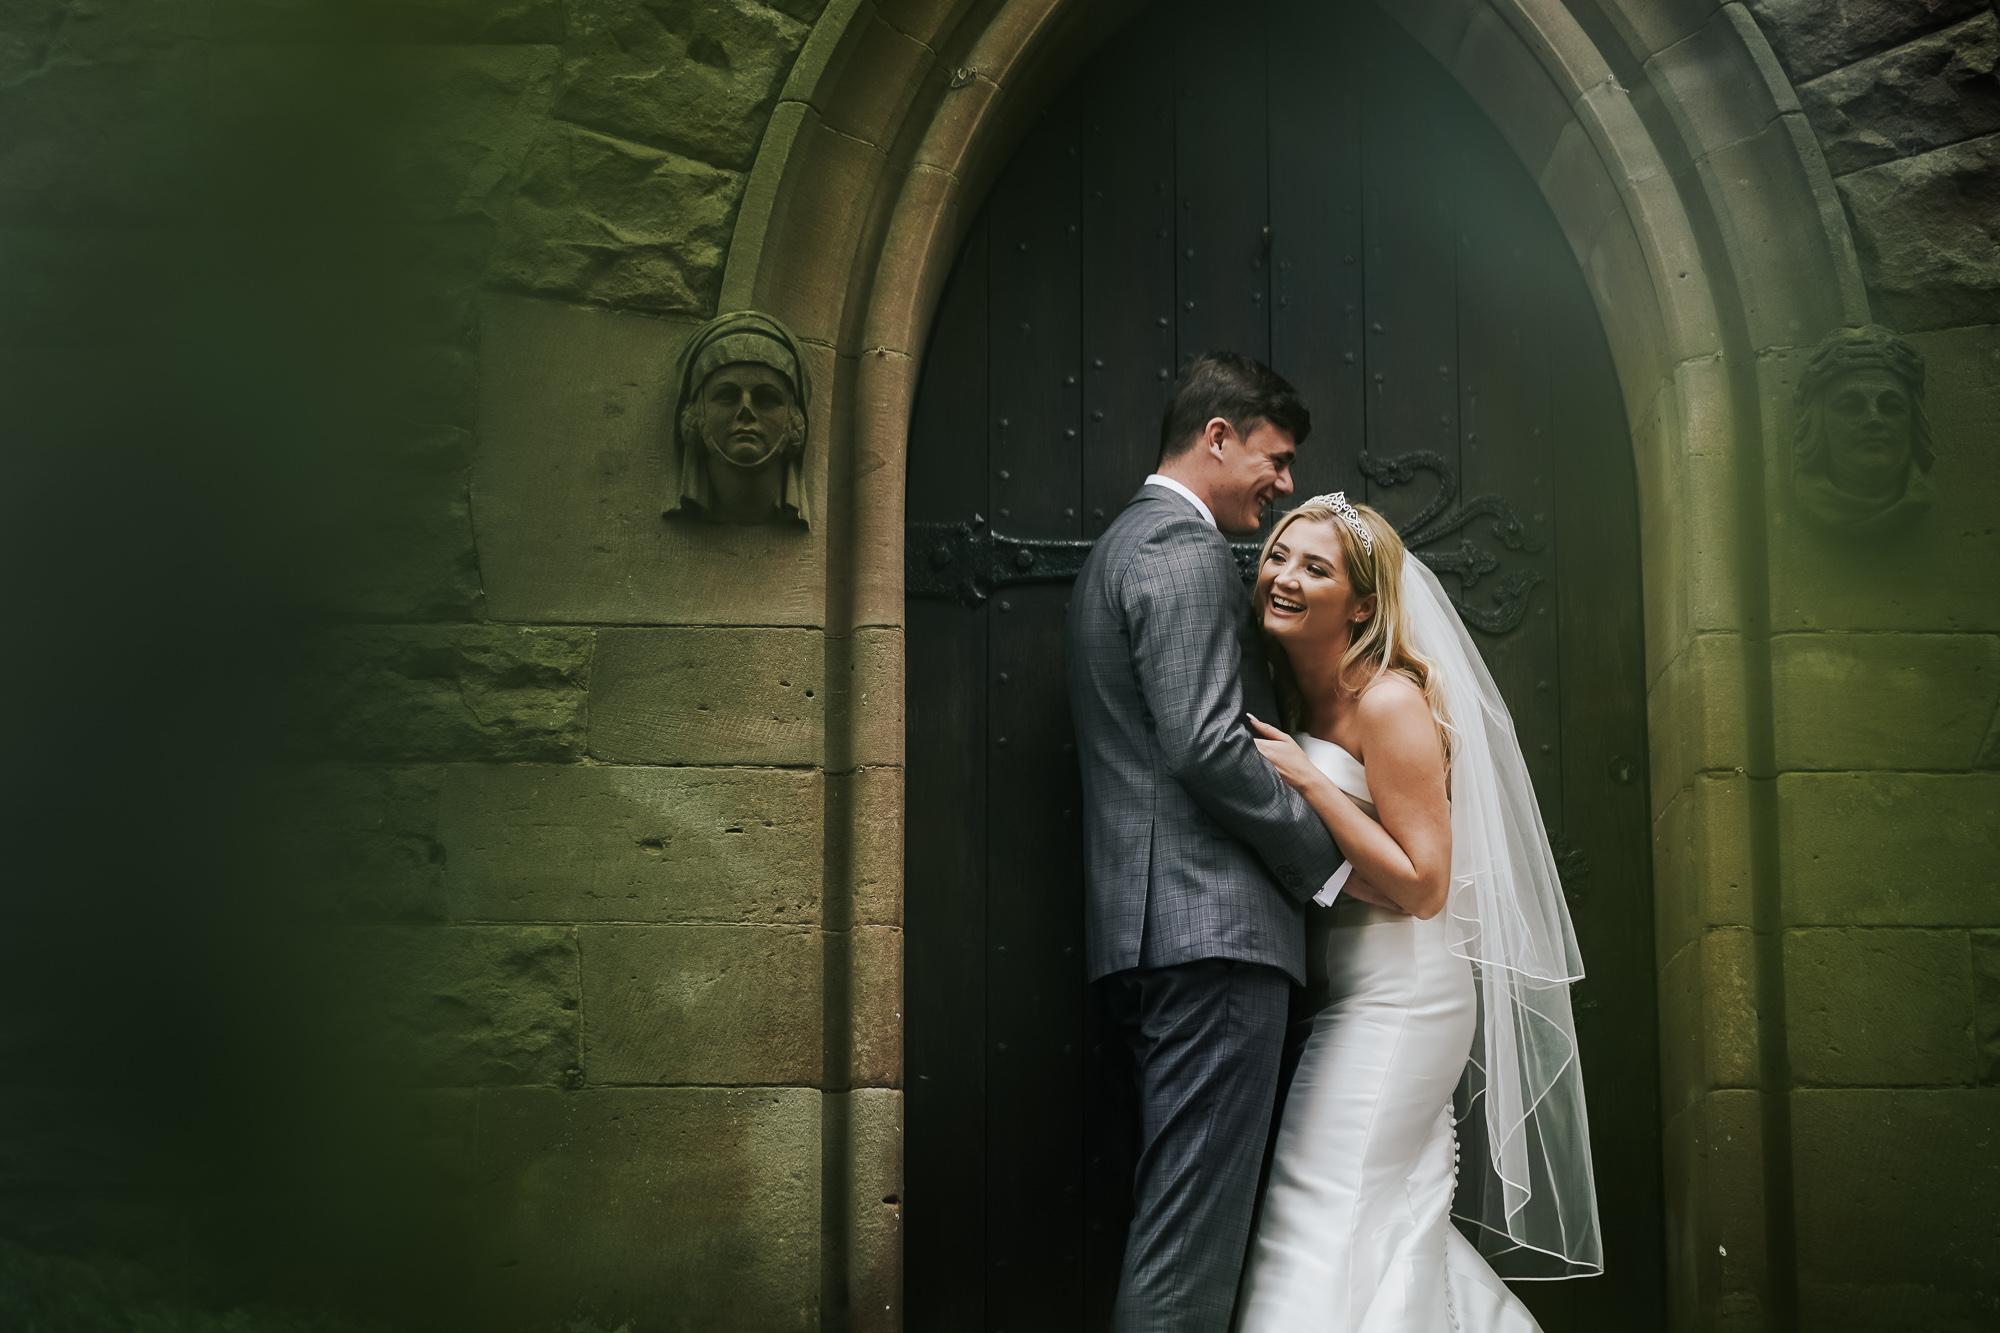 Peckforton Castle wedding photography cheshire wedding photographer (42 of 57).jpg